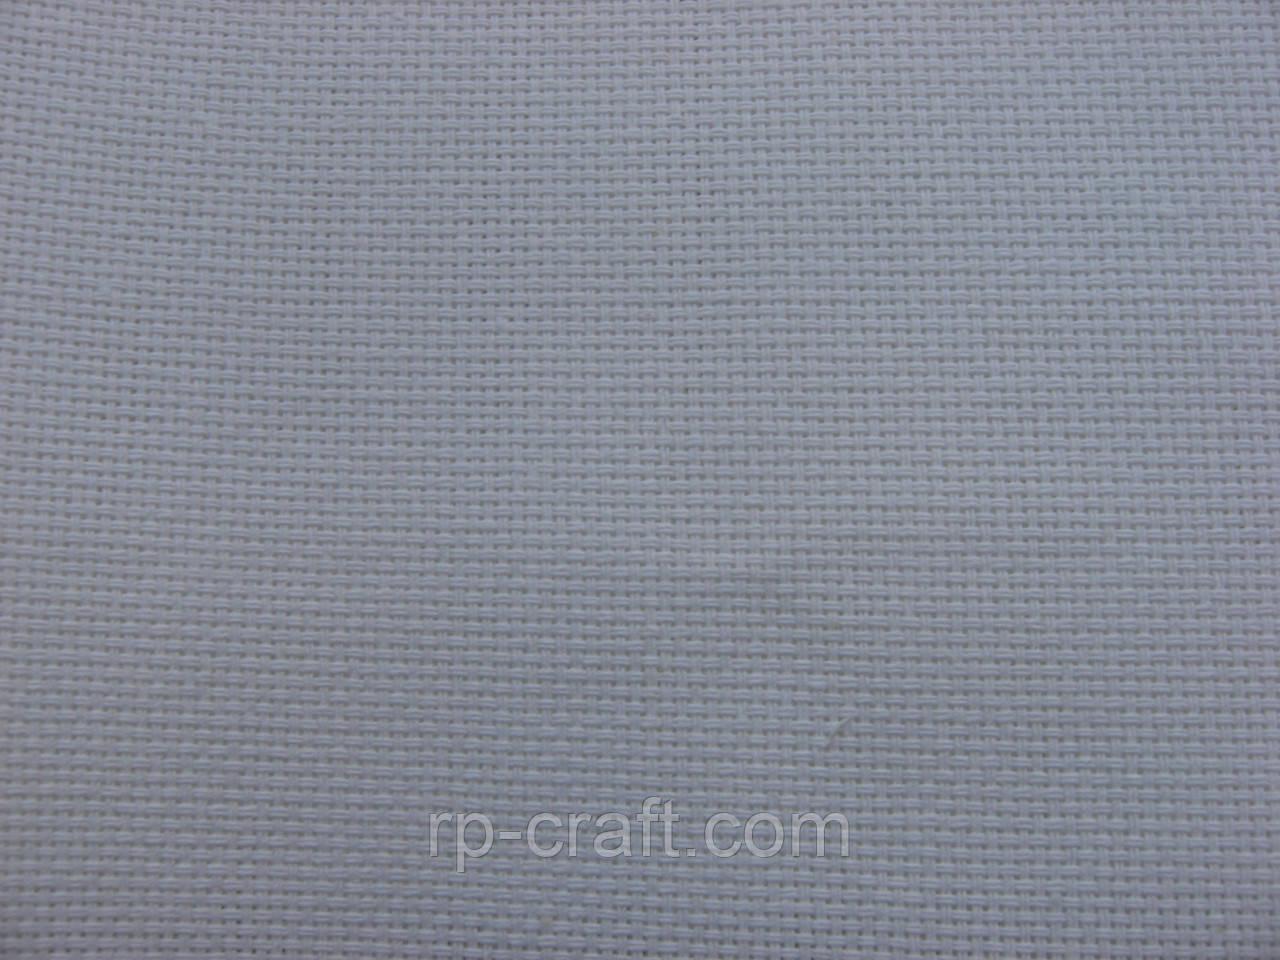 Отрез ткани для вышивки. Двунитка для хардангена, белая, 38х45 см